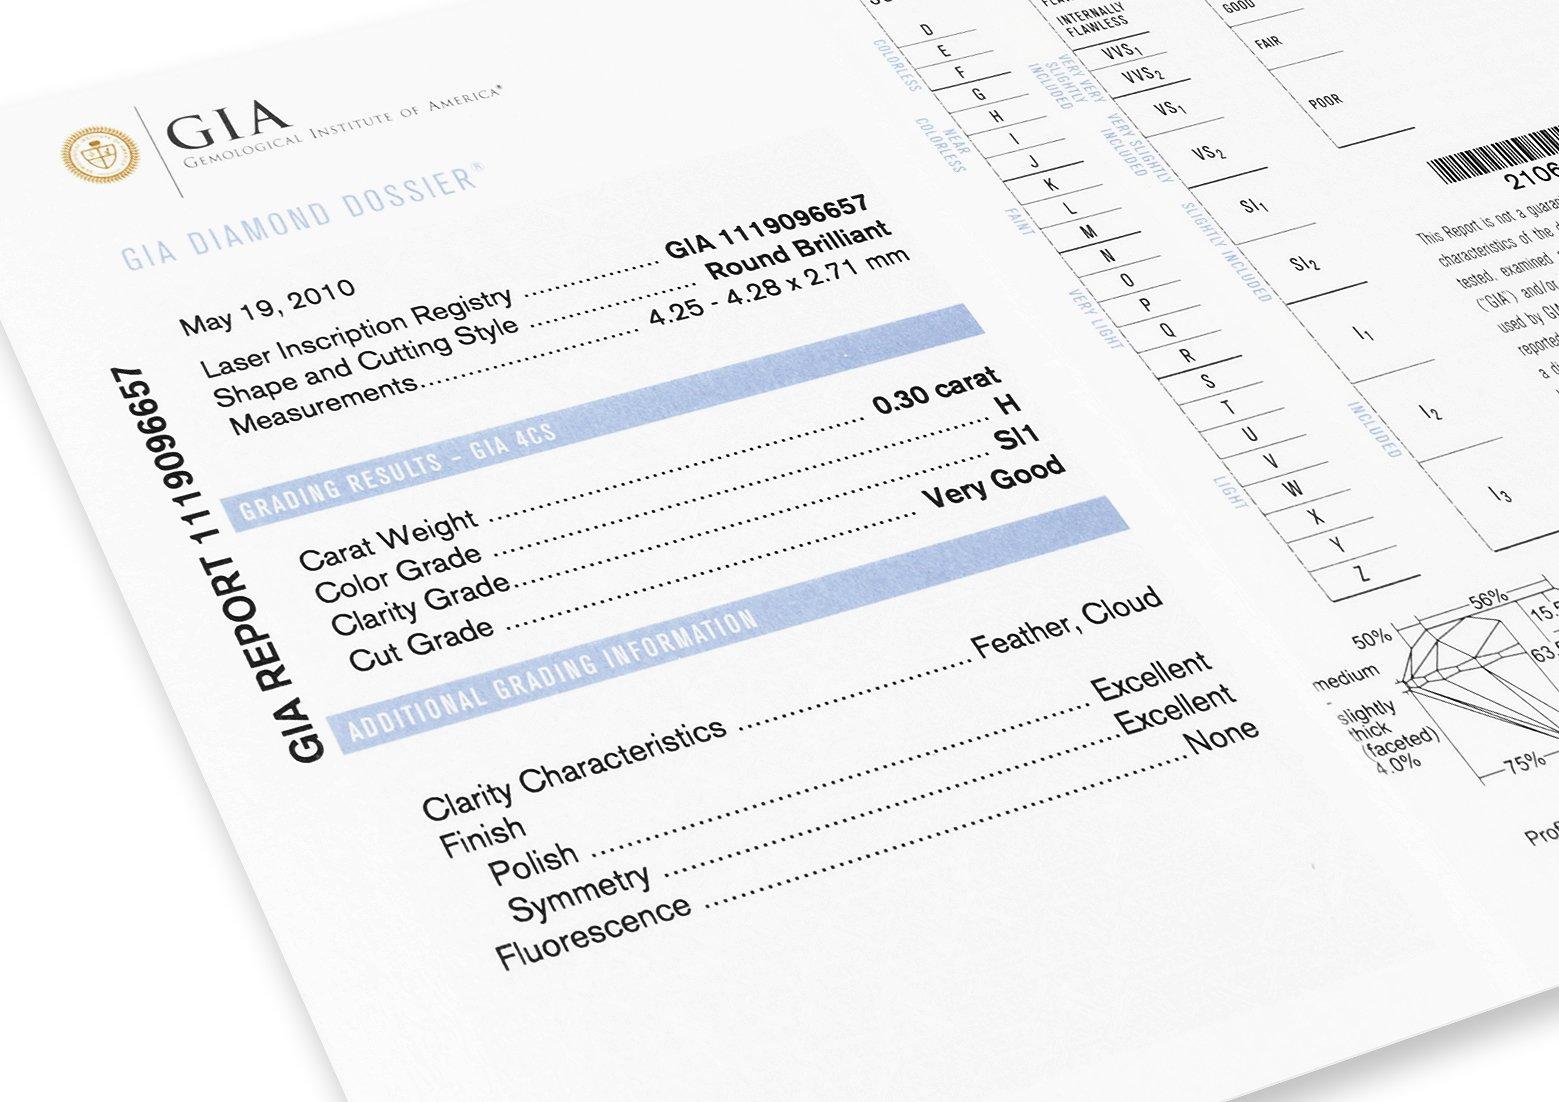 Gia Diamonds Certification For Loose Diamonds Diamond Registry